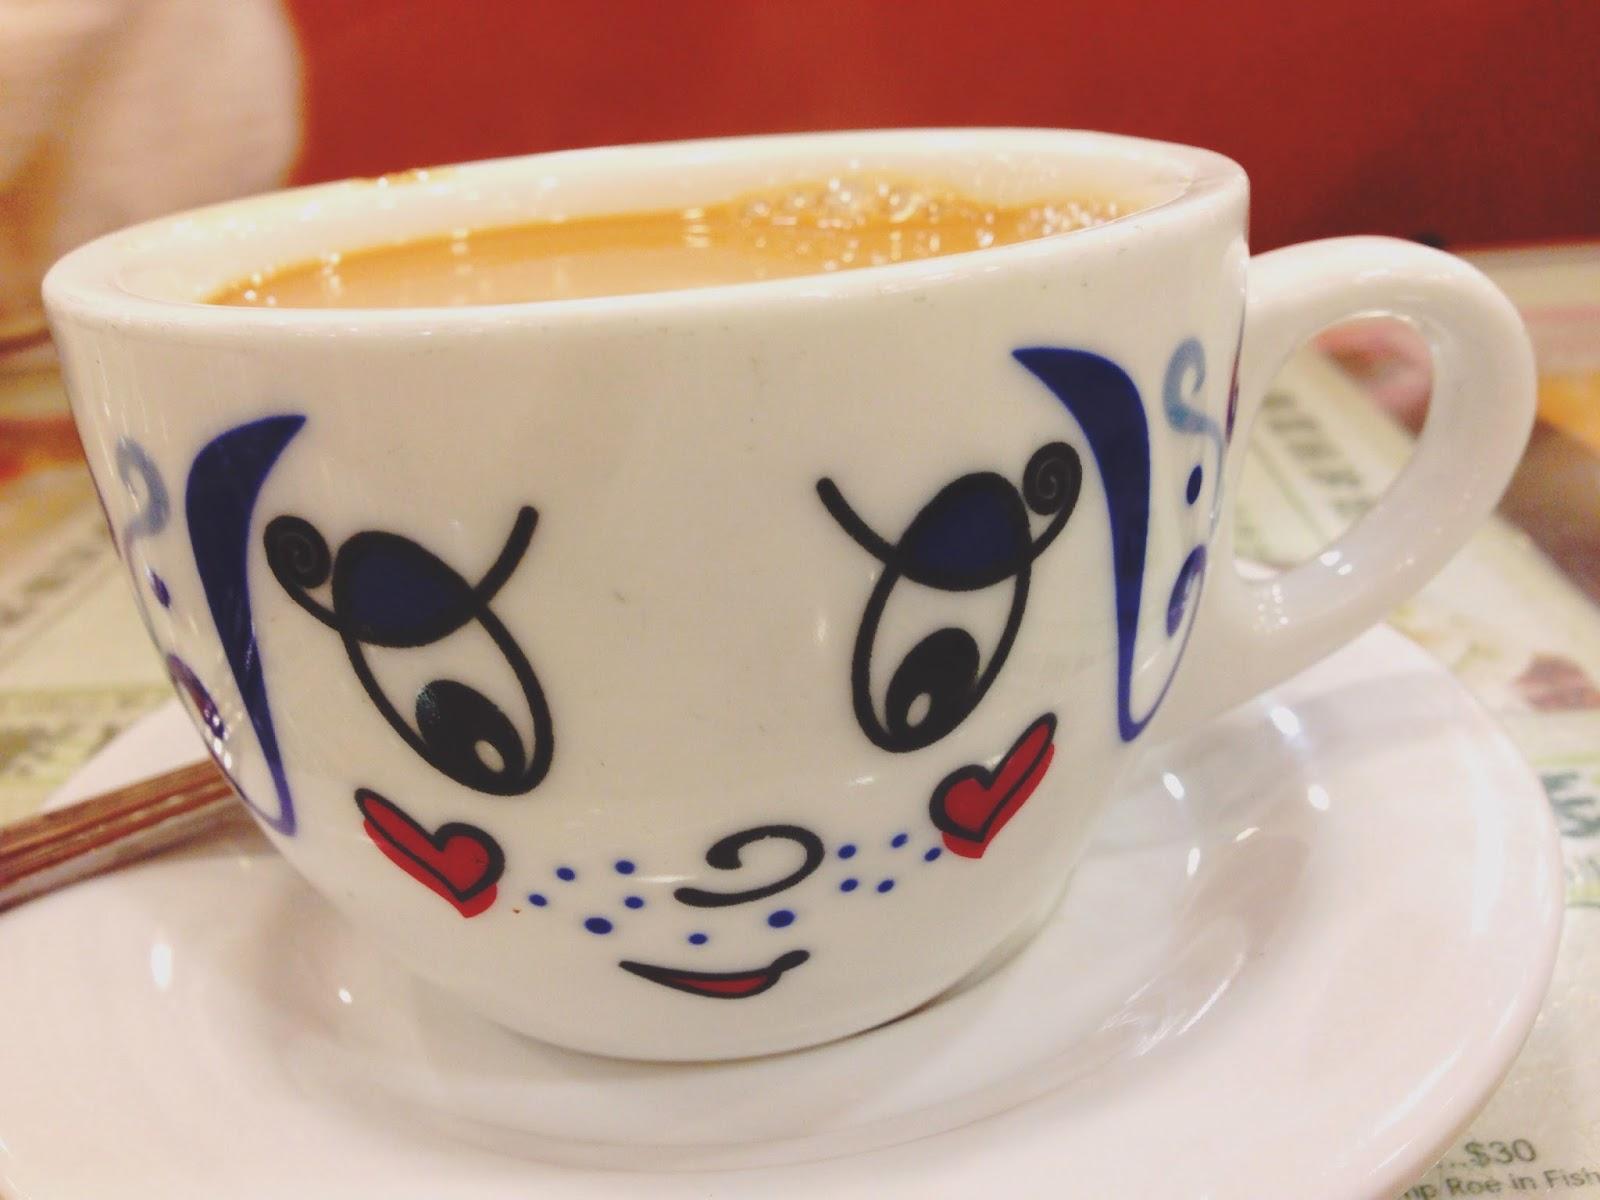 Tsui Wah Restaurant Hong Kong-style Milk Tea